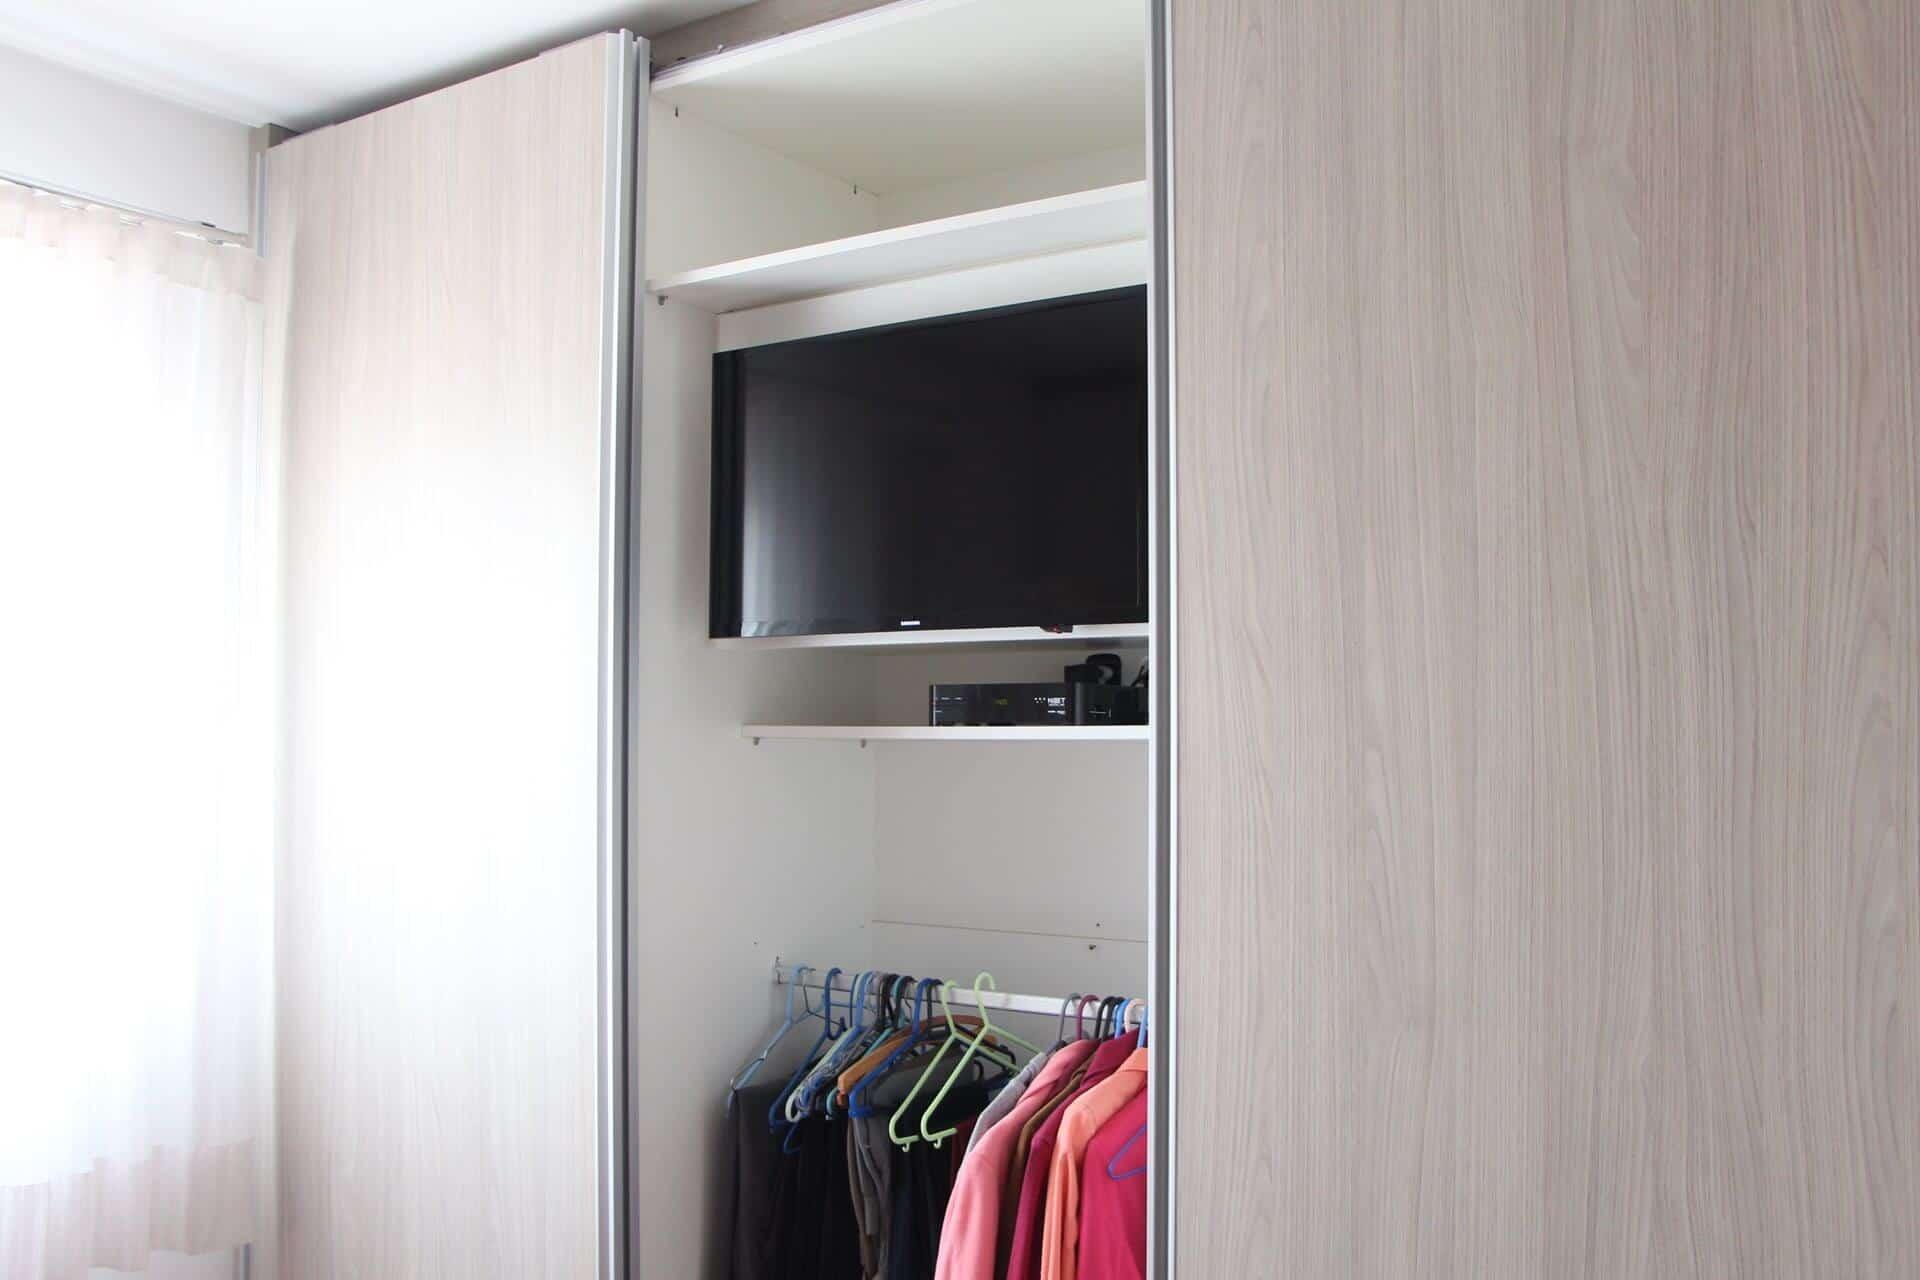 dormitorio-planejado_moveis-sob-medida-galeria-88